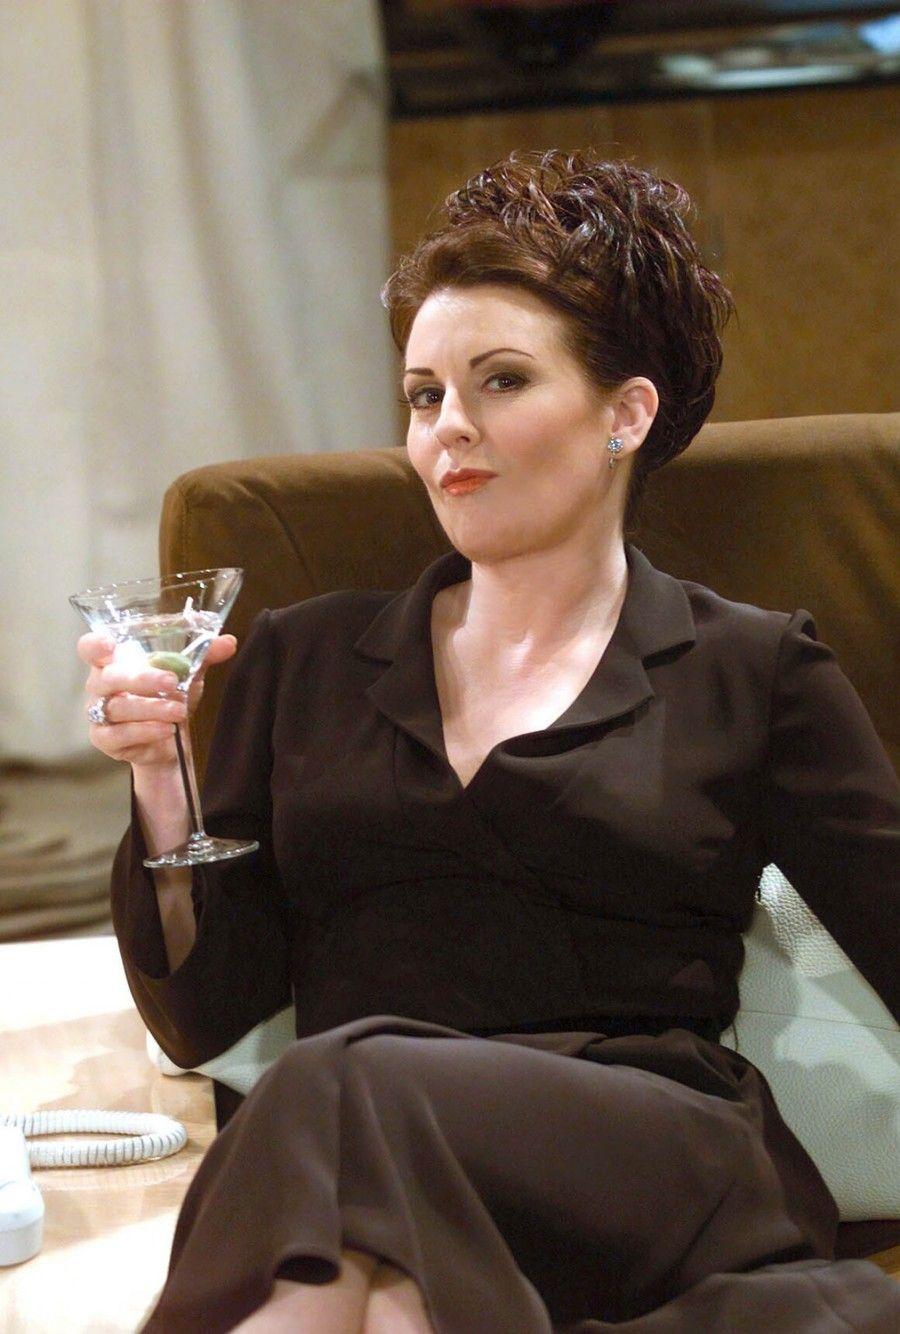 WILL & GRACE -- NBC Series -- Pictured: Megan Mullally as Karen Walker -- NBC Photo: Chris Haston